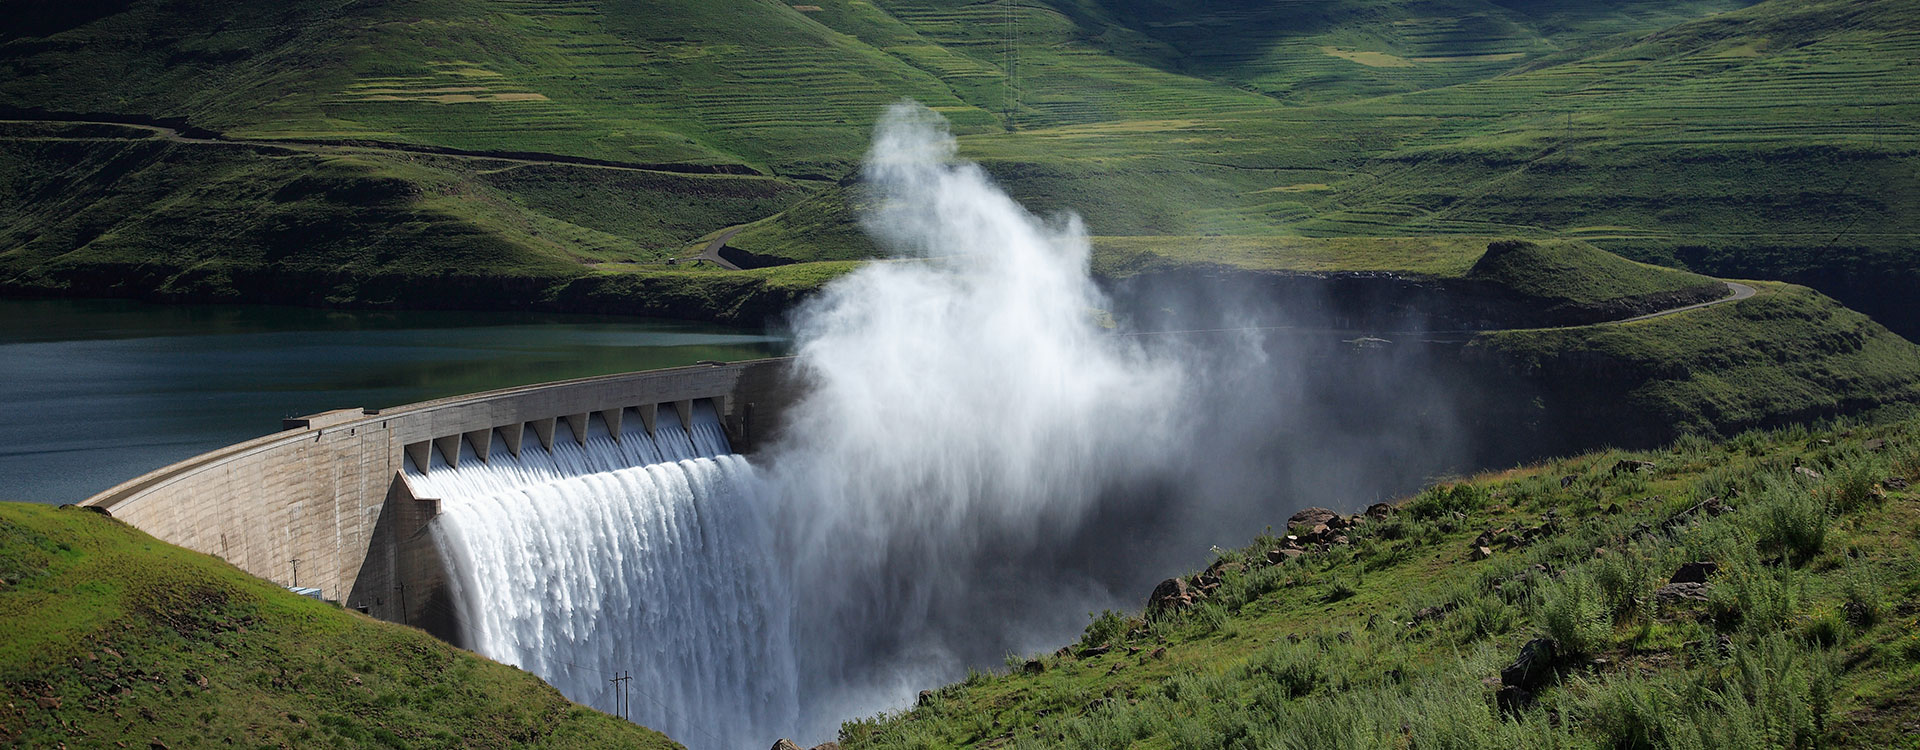 slider-dam-wall